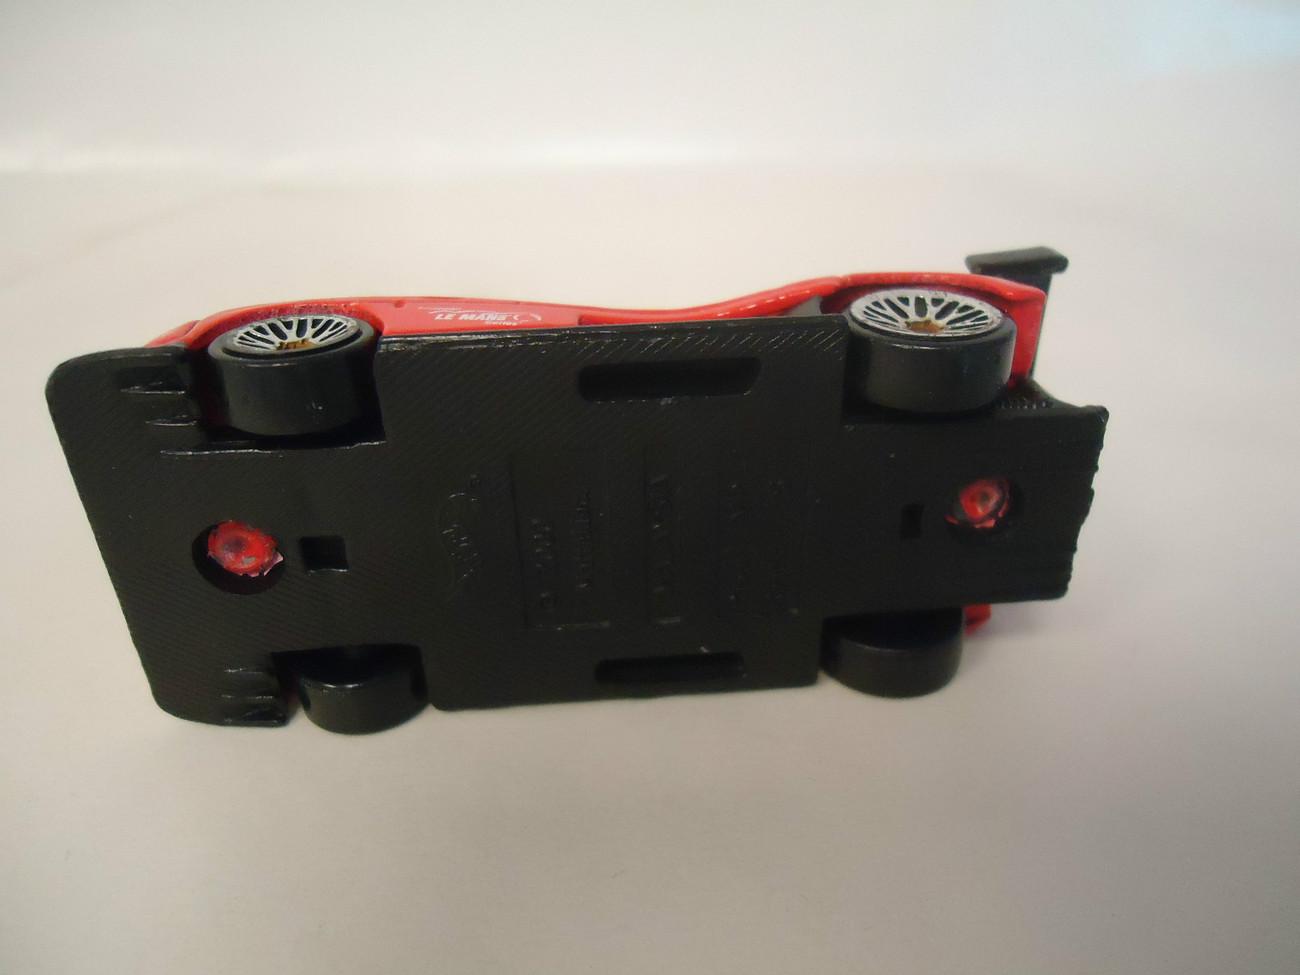 Mattel HOT WHEELS - 2000 - PANOZ LMP-1 ROADSTER S